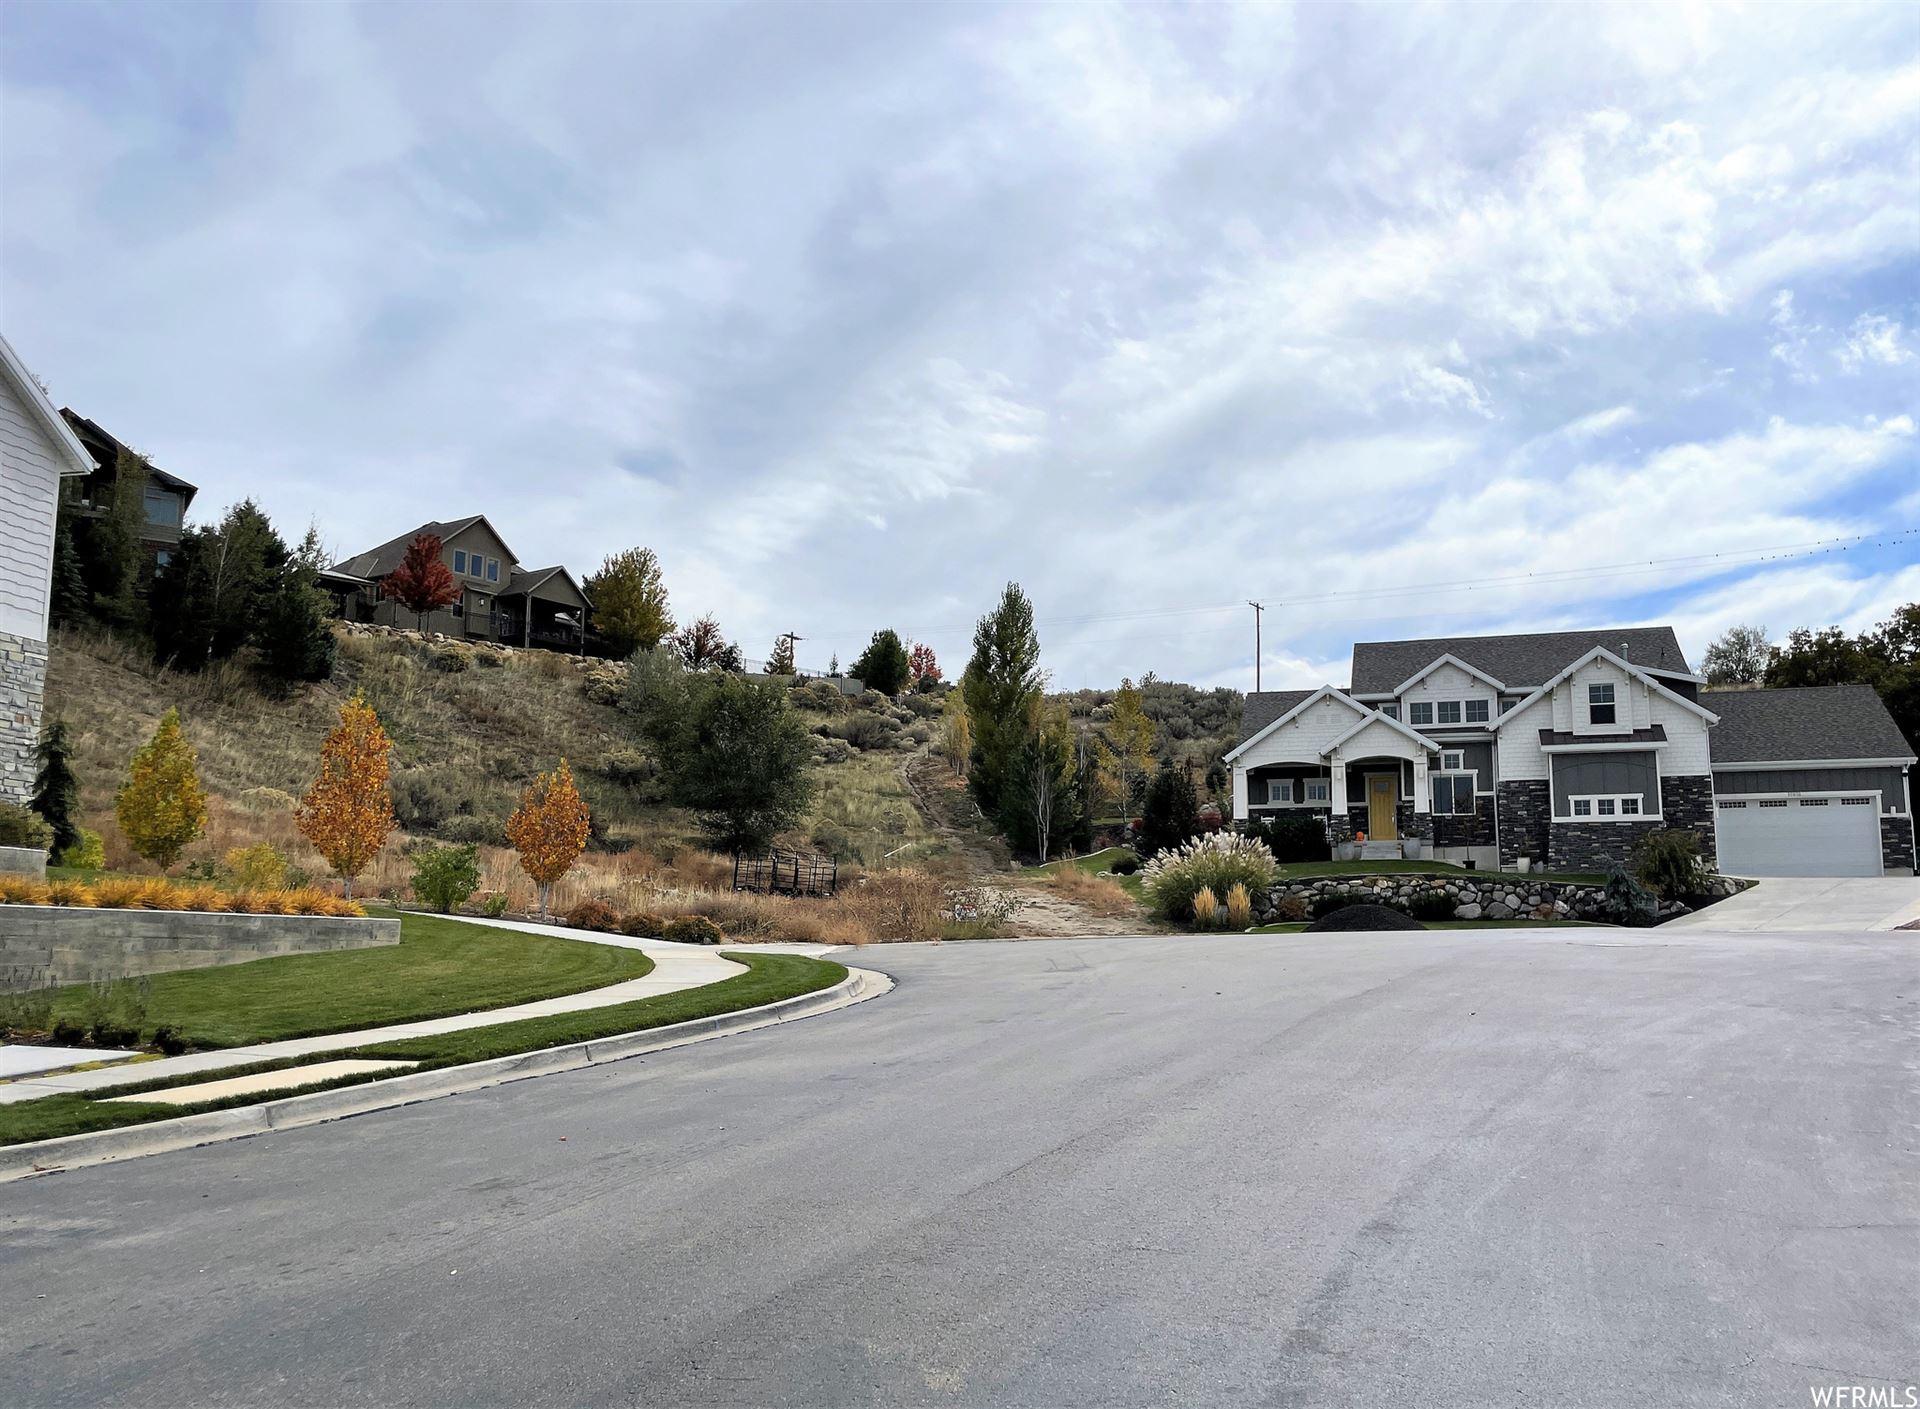 Photo of 10442 N QUAIL CT, Highland, UT 84003 (MLS # 1775898)